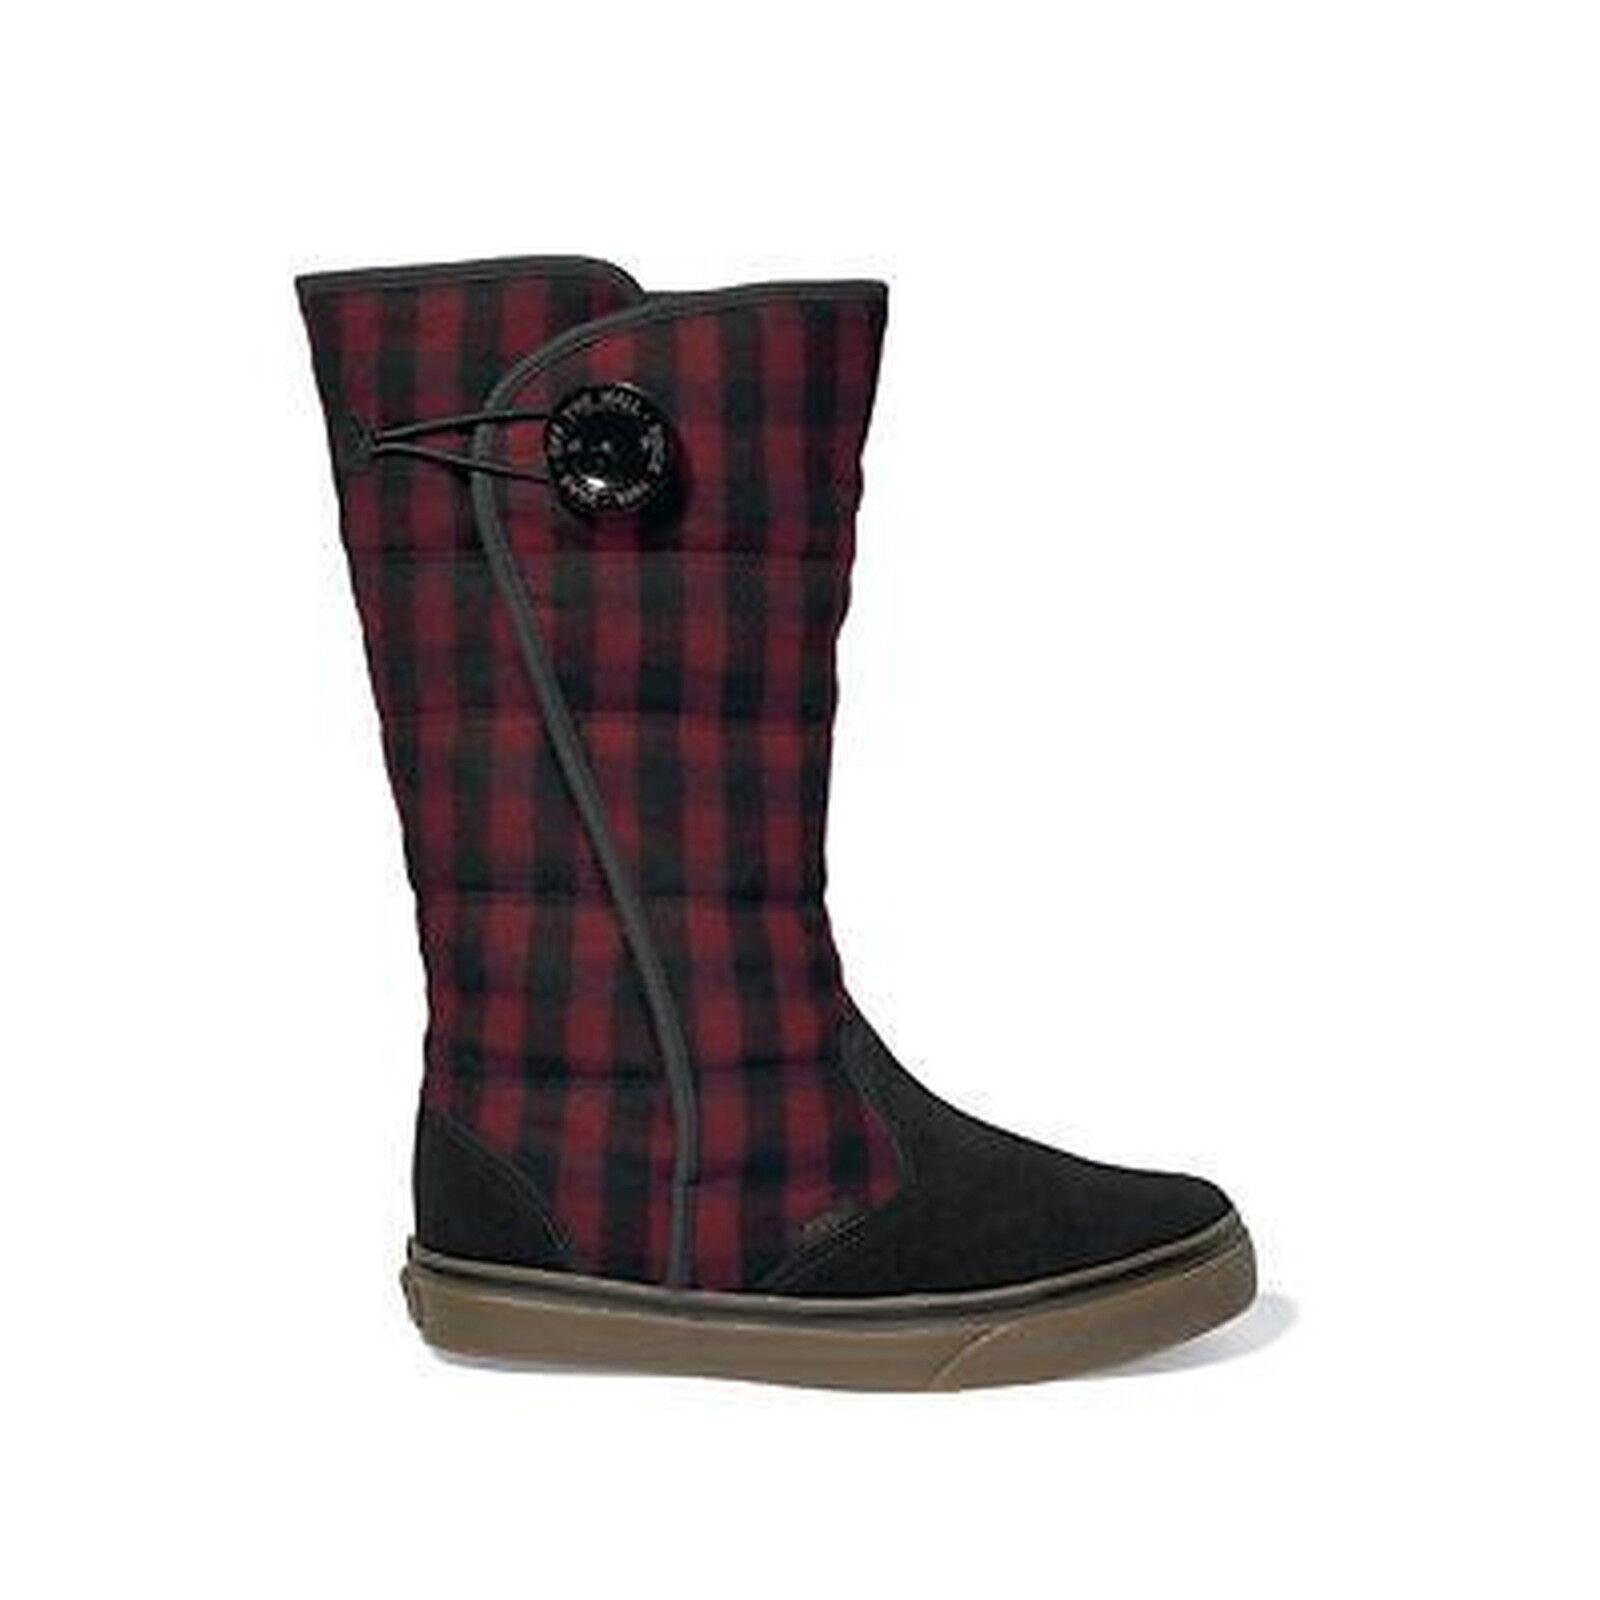 Miglior prezzo Vans Vans Vans Scarpe da Donna Stivali Phoebe scarpe ROSSO NERO  acquisti online